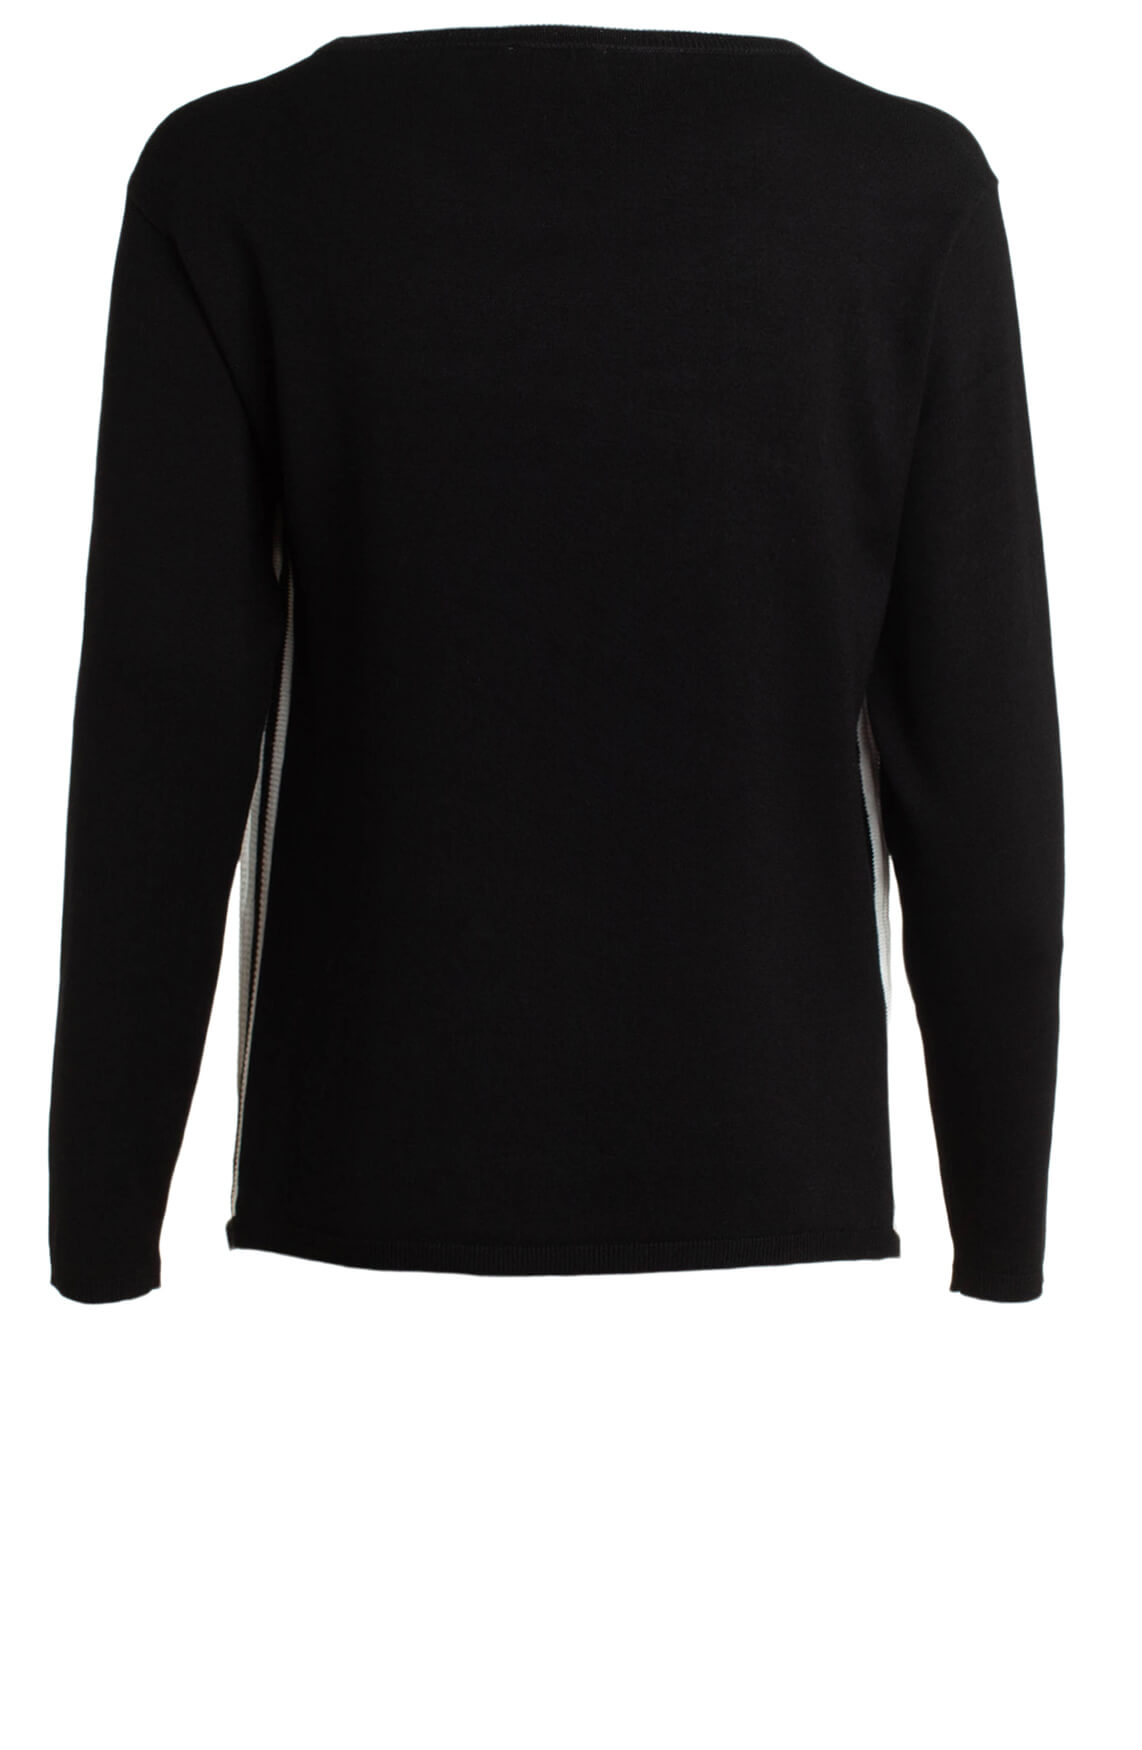 Anna Dames Pullover met bies zwart